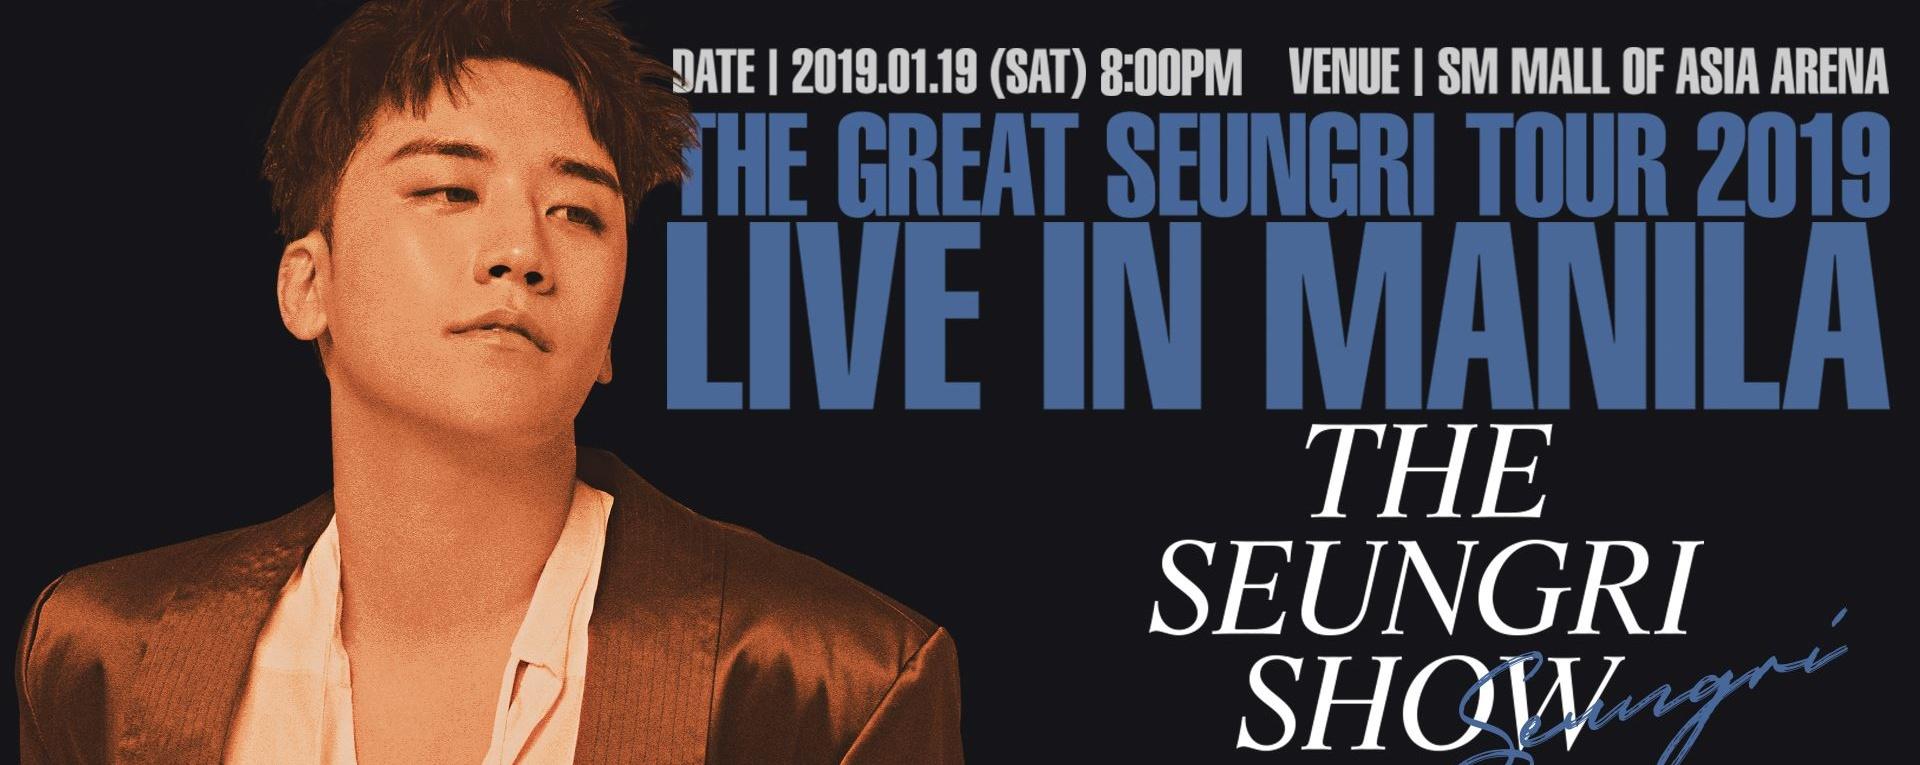 The Great Seungri Live in Manila